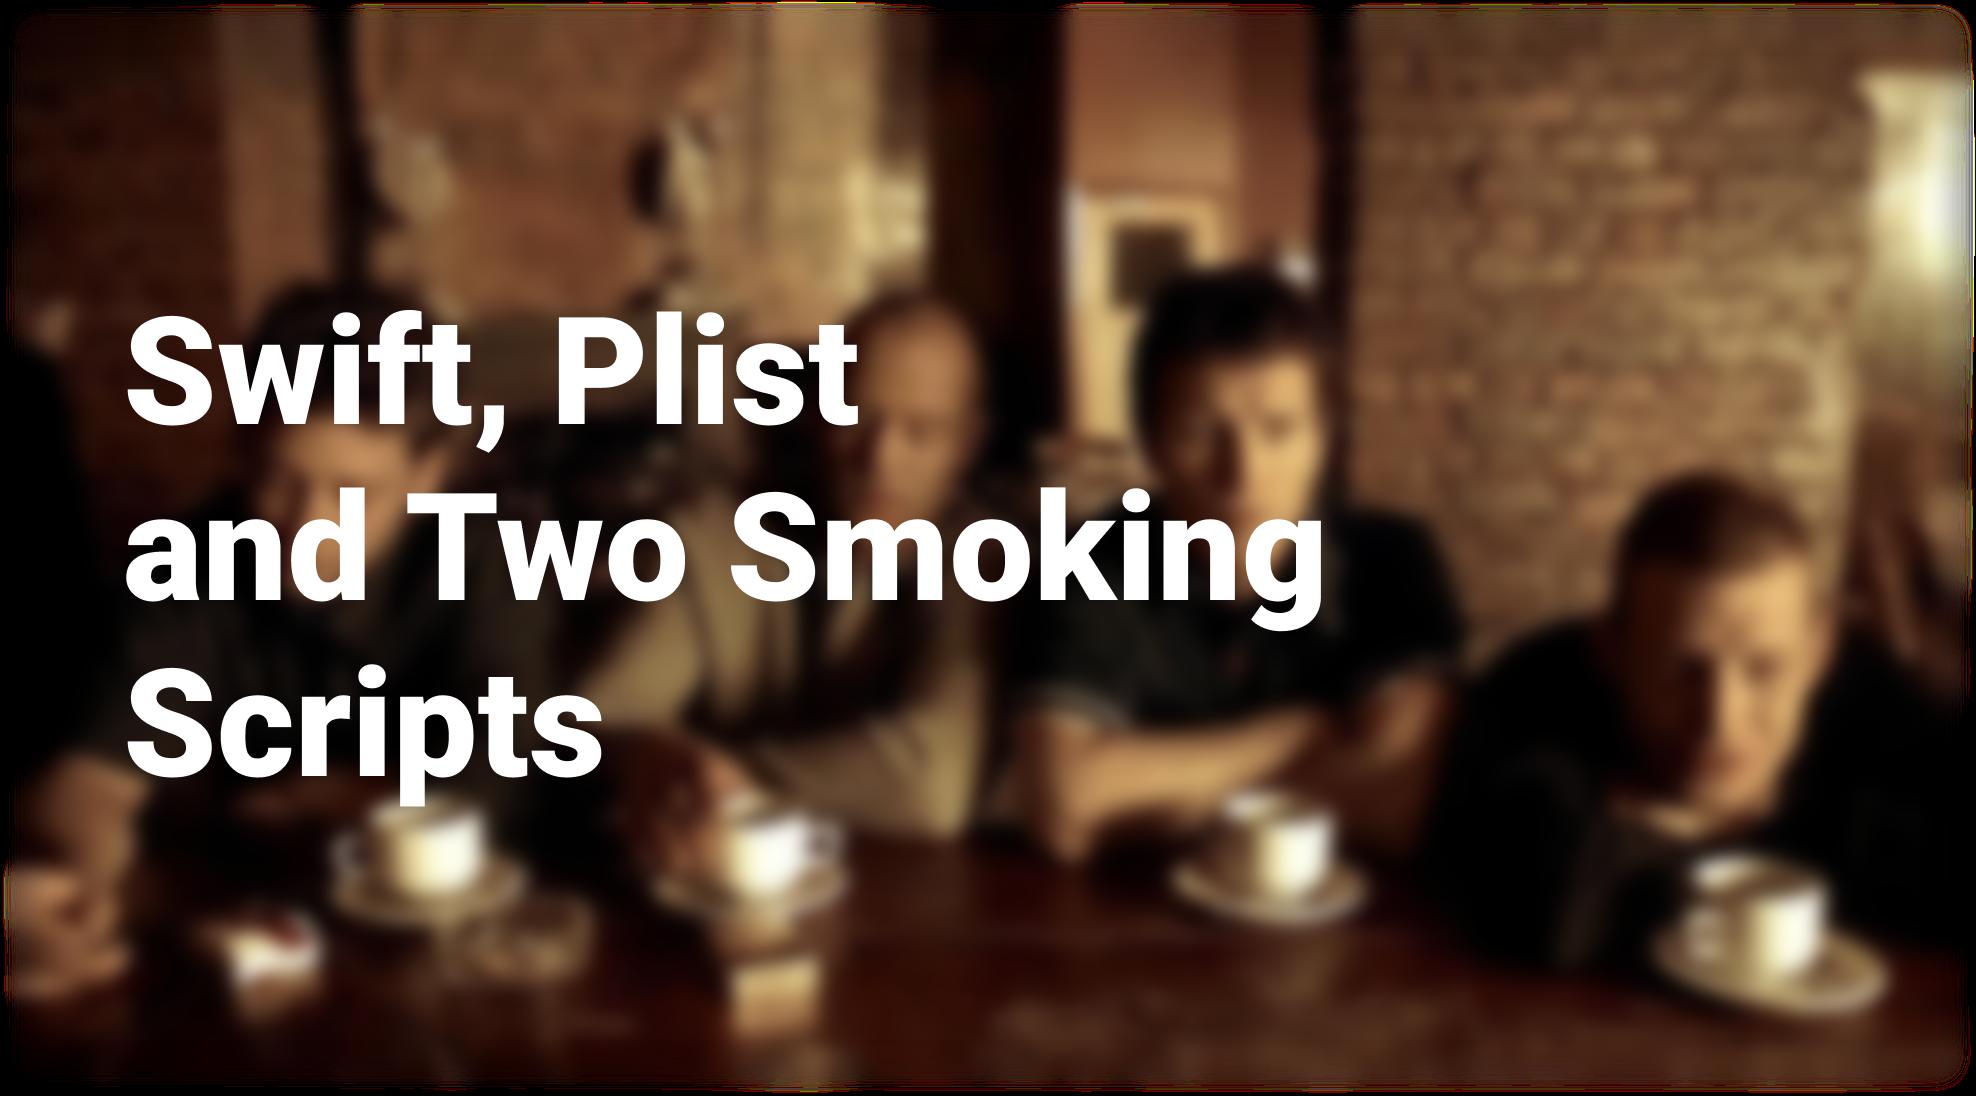 Swift, Plist and Two SmokingScripts